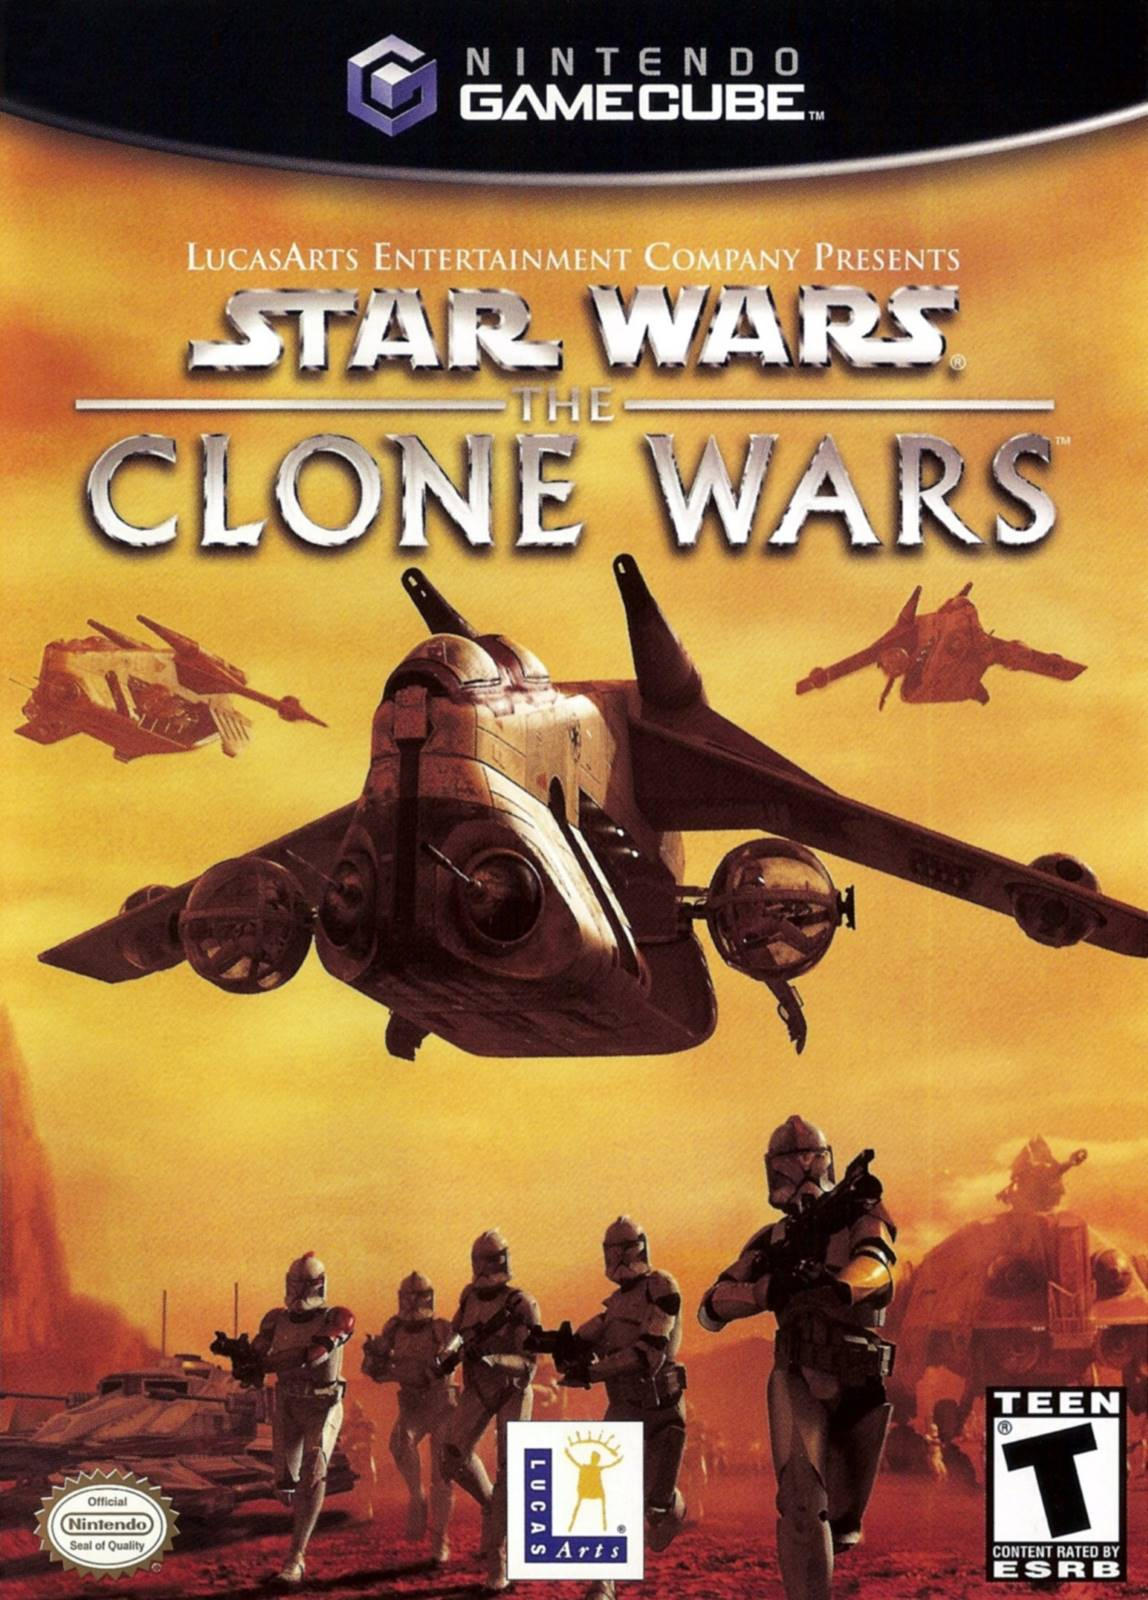 Star Wars Clone Wars Gamecube Game